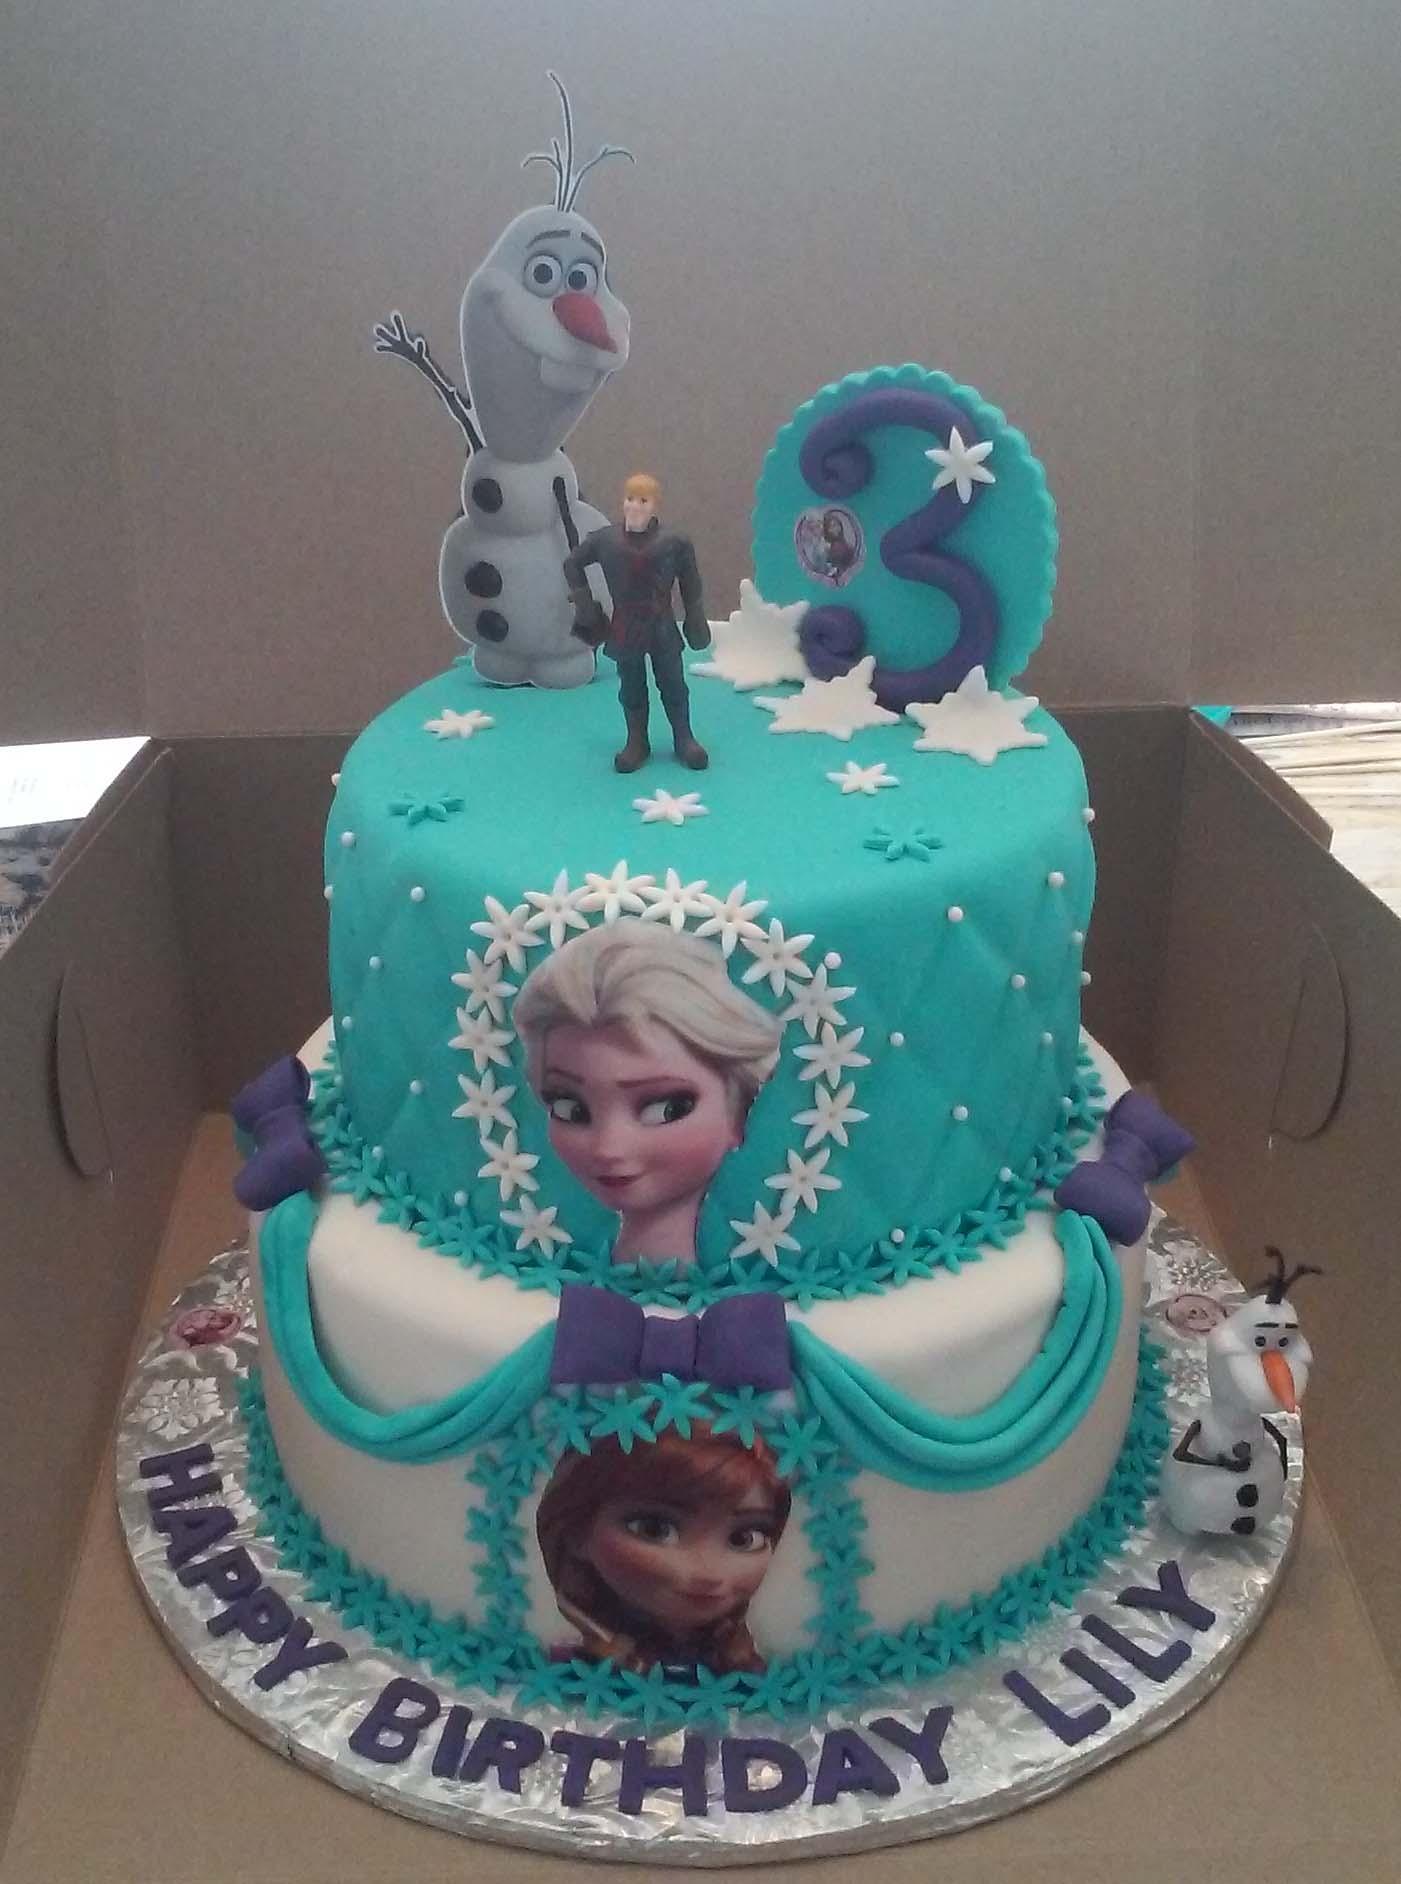 Outstanding 9 Elsa Themed Birthday Cakes Photo Birthday Cake Frozen Elsa Birthday Cards Printable Trancafe Filternl